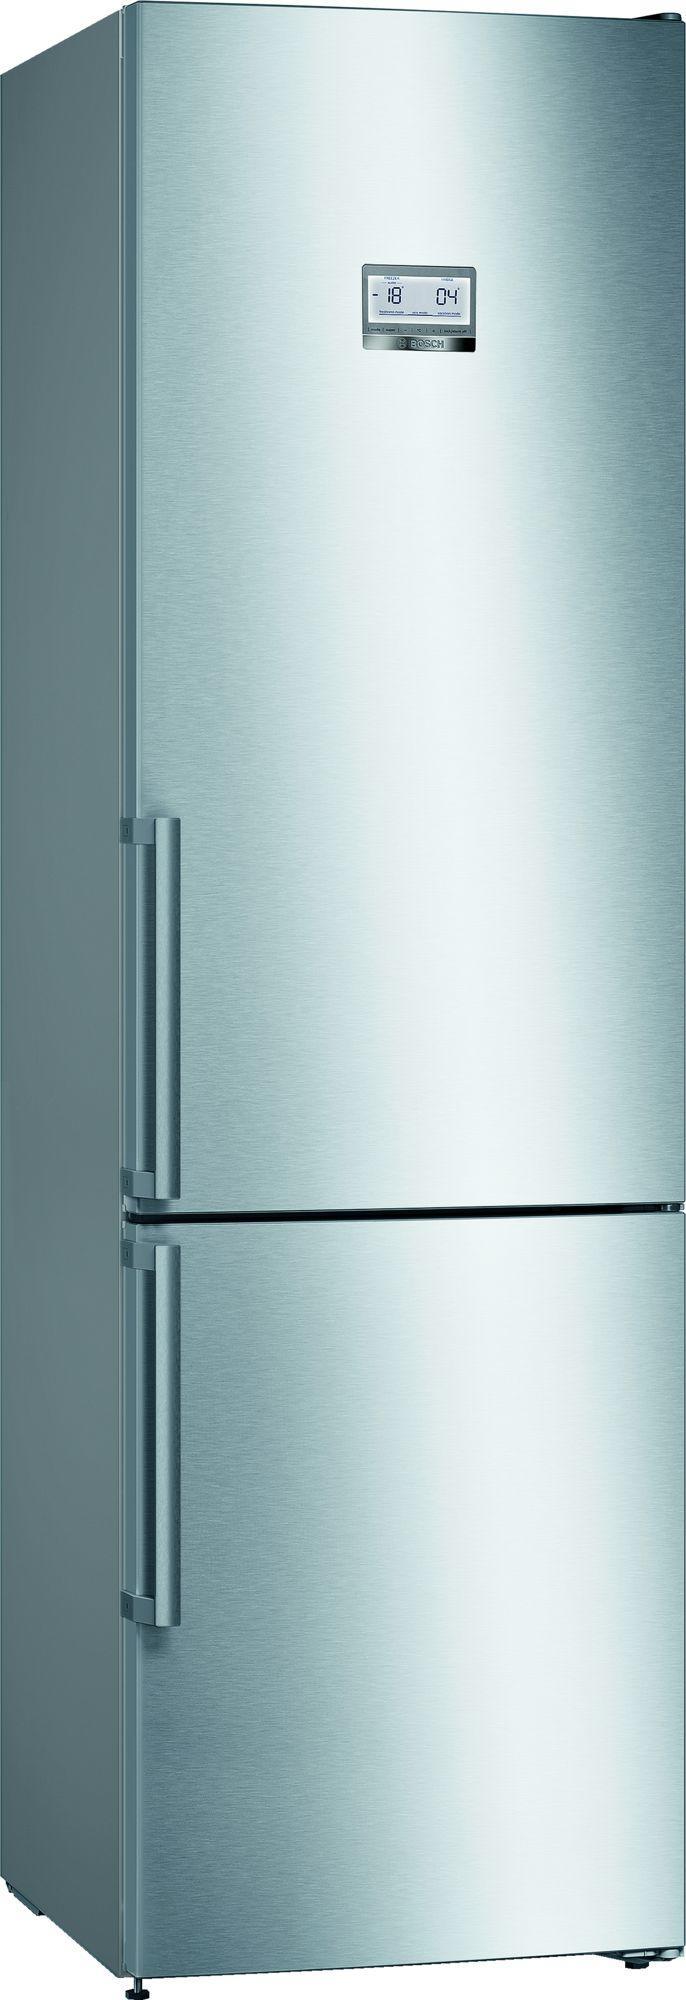 Image of Serie 6 KGN39HIEP 60cm 366 Litre No Frost Fridge Freezer | Silver Innox